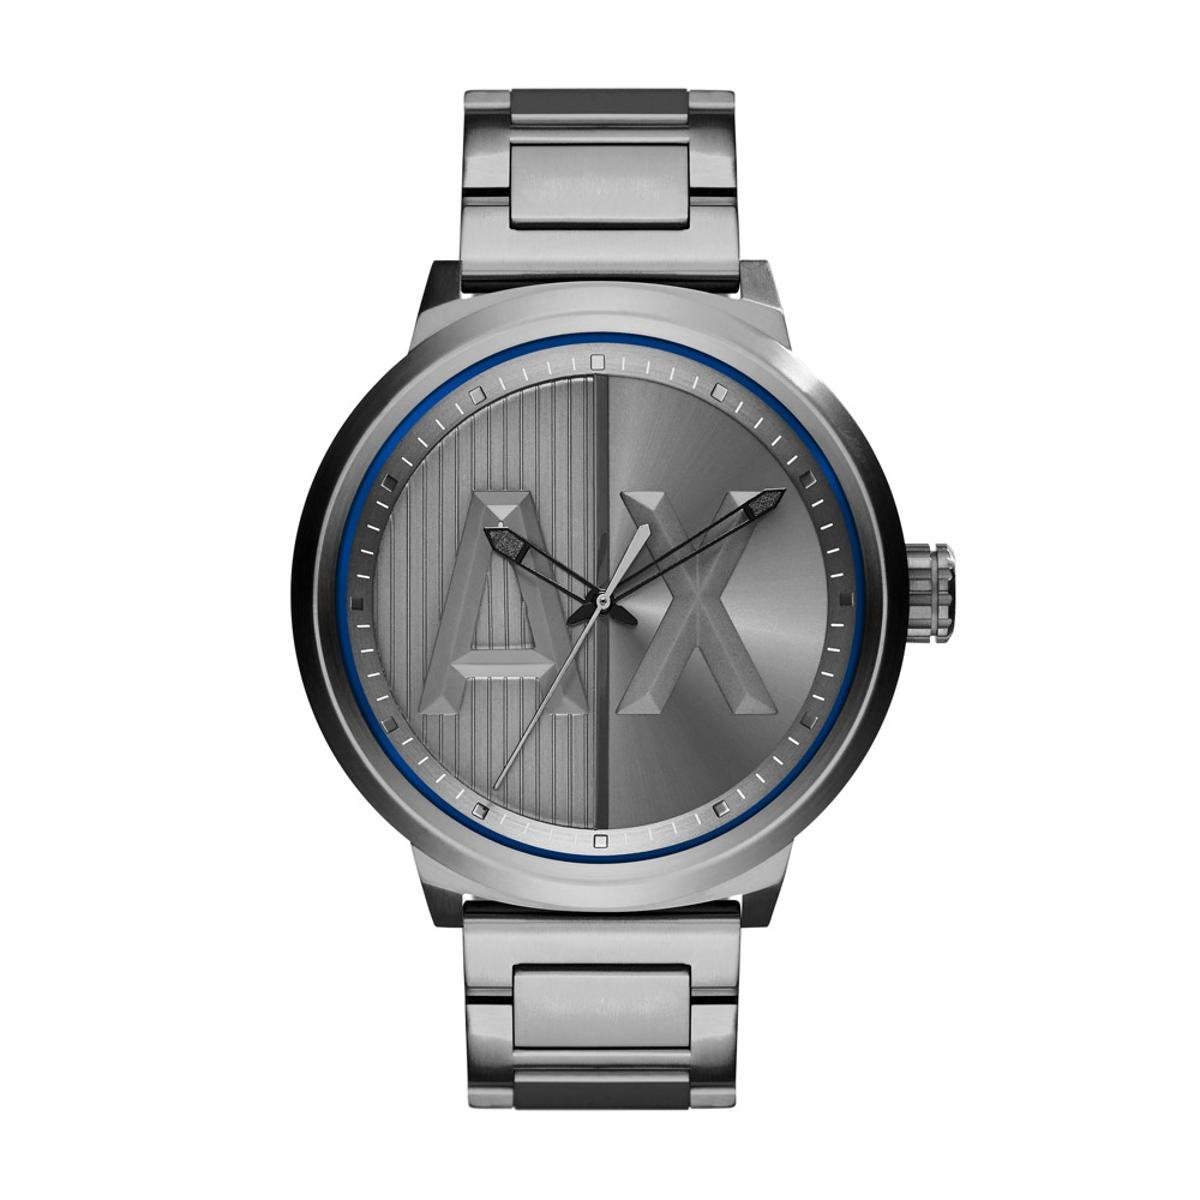 1672874f20bcc Relógio Masculino Armani Exchange ATLC - AX1362 1CN AX1362 1CN - Compre  Agora